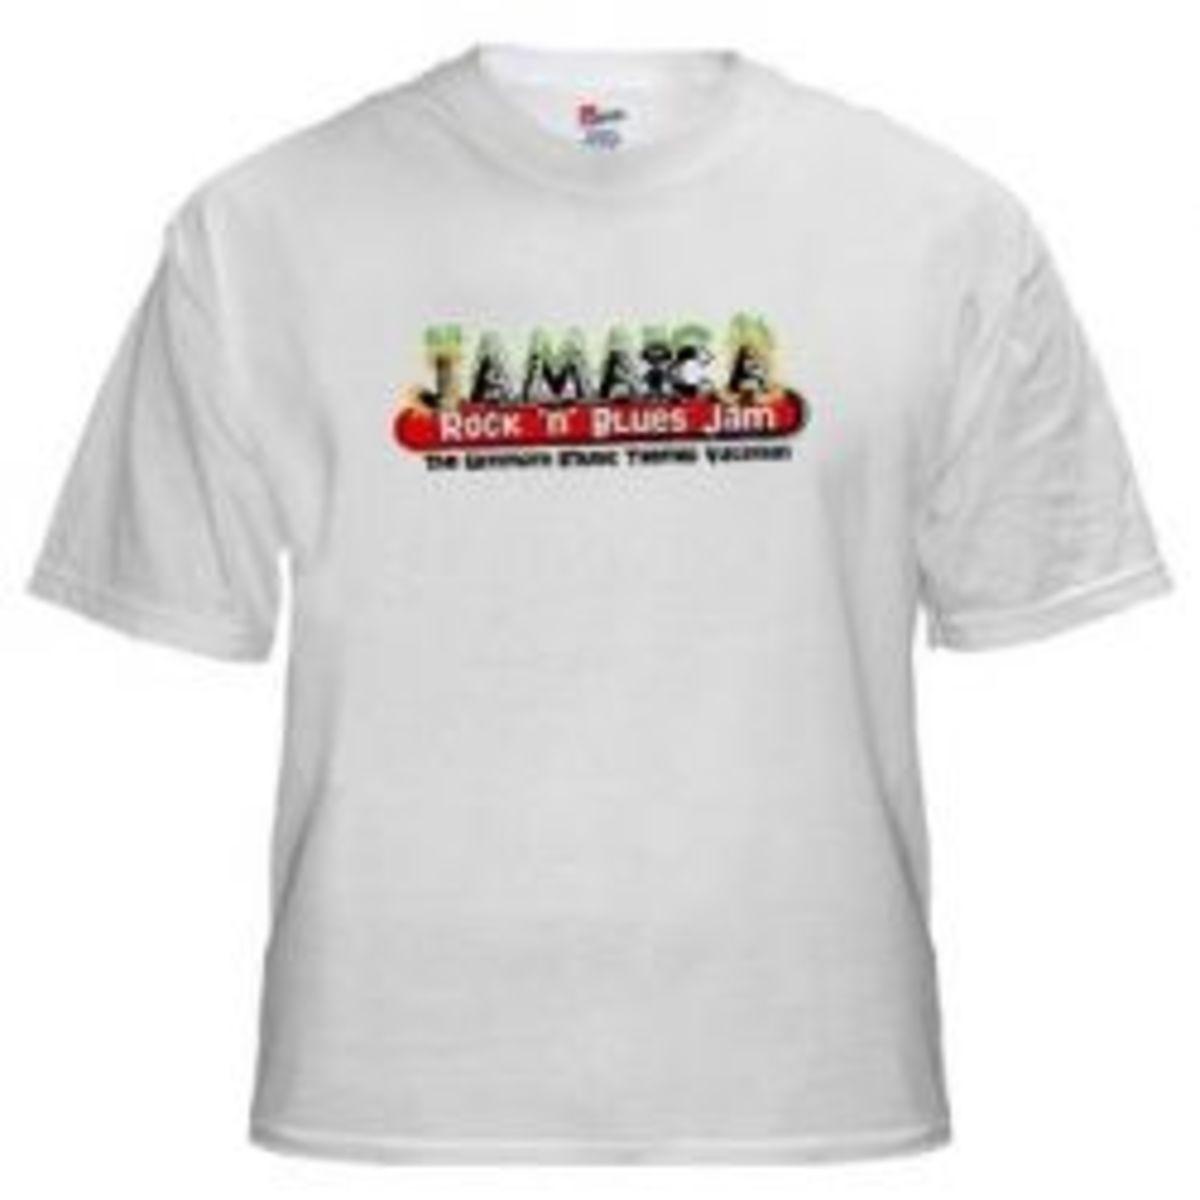 Jamaica Rock 'n' Blues Jam Shirt